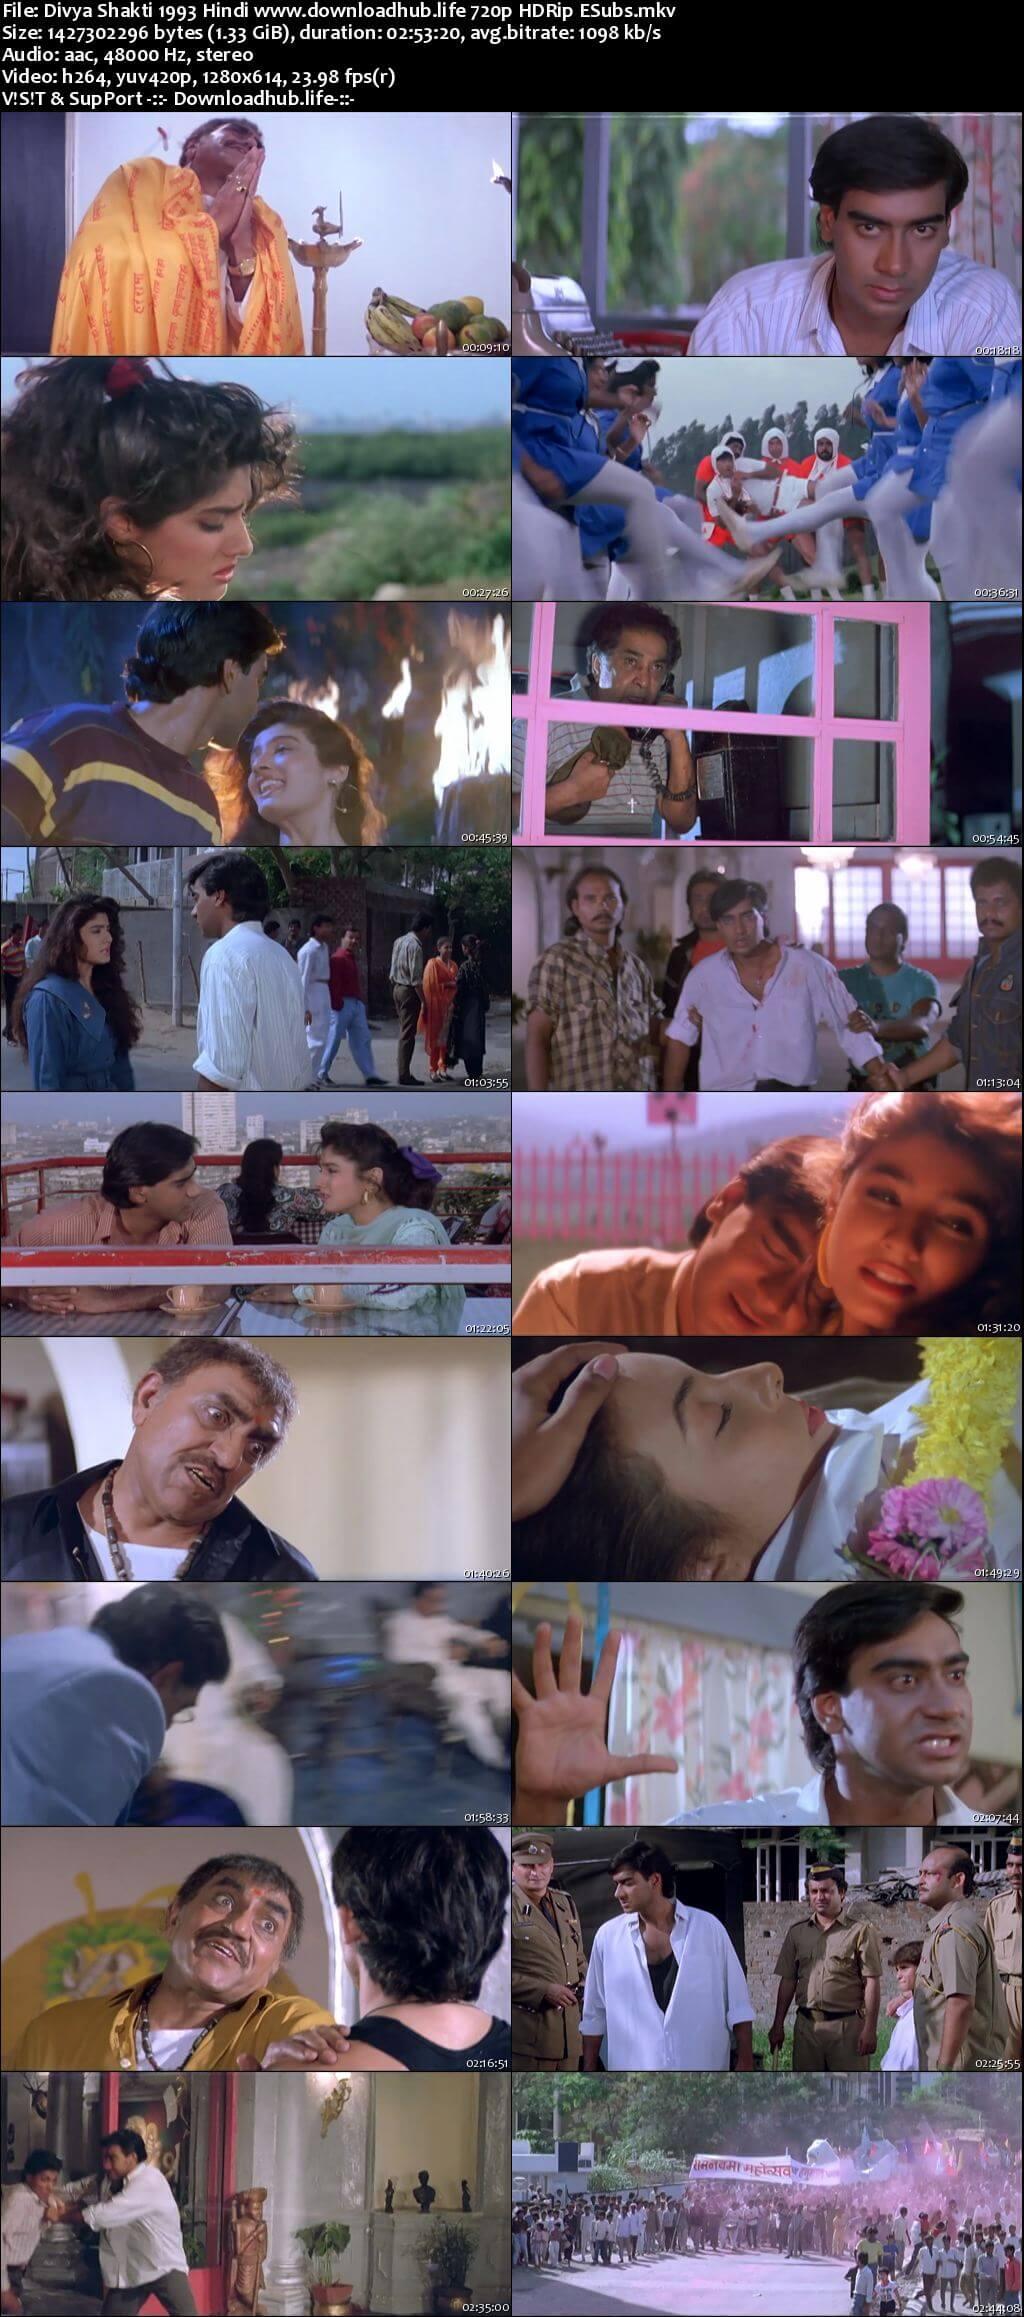 Divya Shakti 1993 Hindi 720p HDRip ESubs